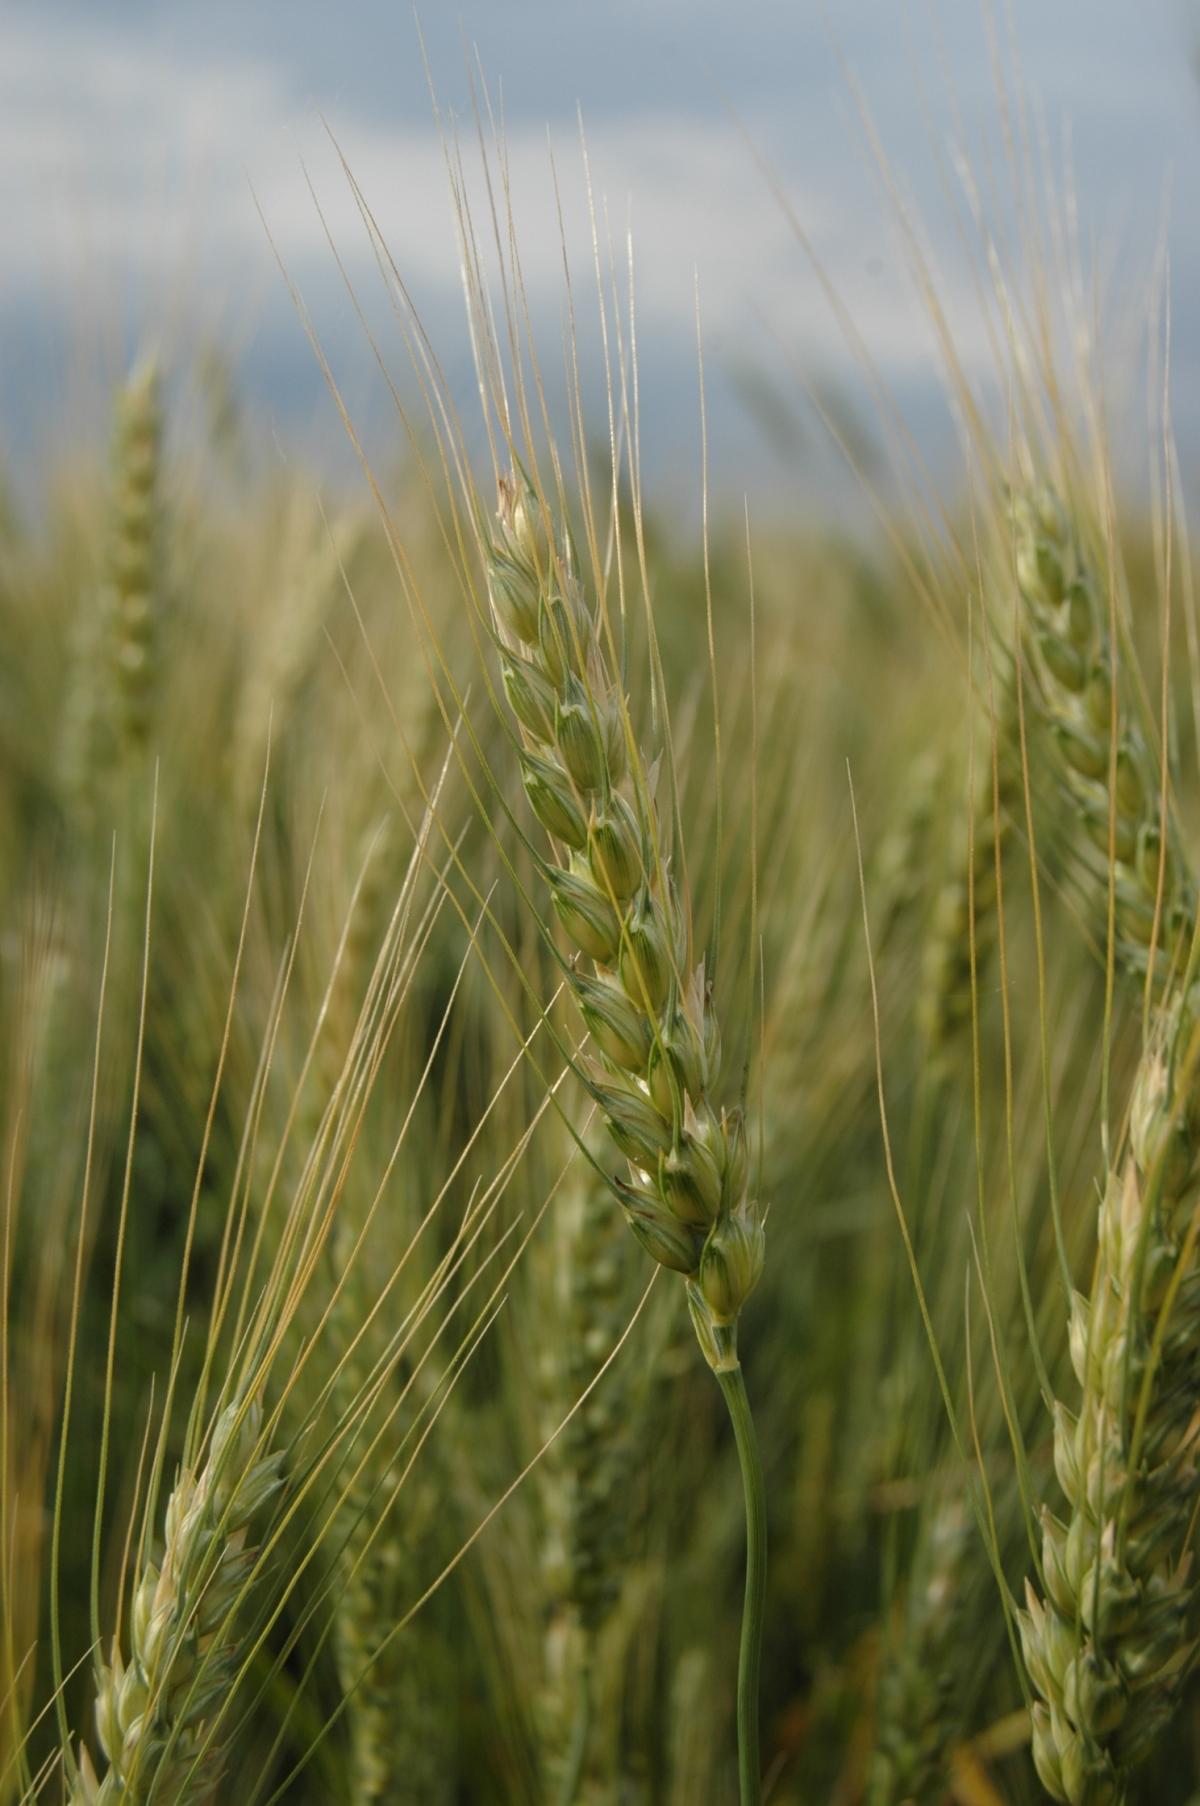 Wheat almost ready - Safe Haven Farm, Haven, KS